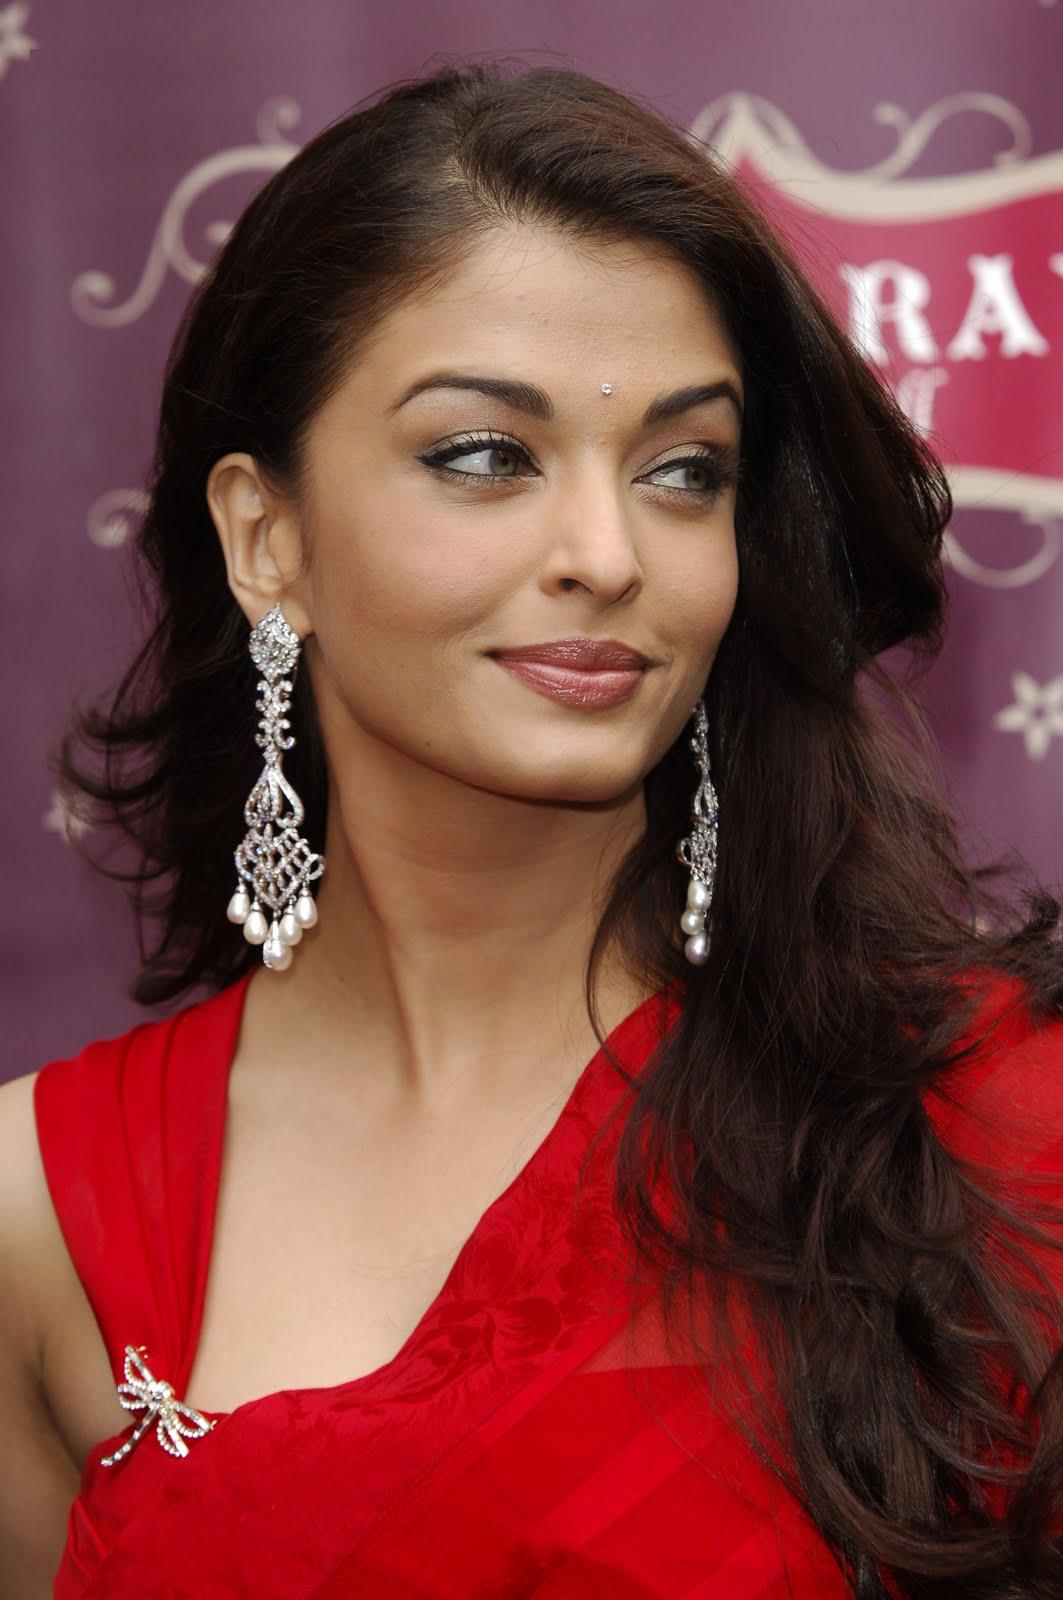 http://2.bp.blogspot.com/-z2xVlZZGekA/TmpyVxGB3qI/AAAAAAAAF_0/b5eplkD2TEI/s1600/Bollywood+actress+super+images1.jpg